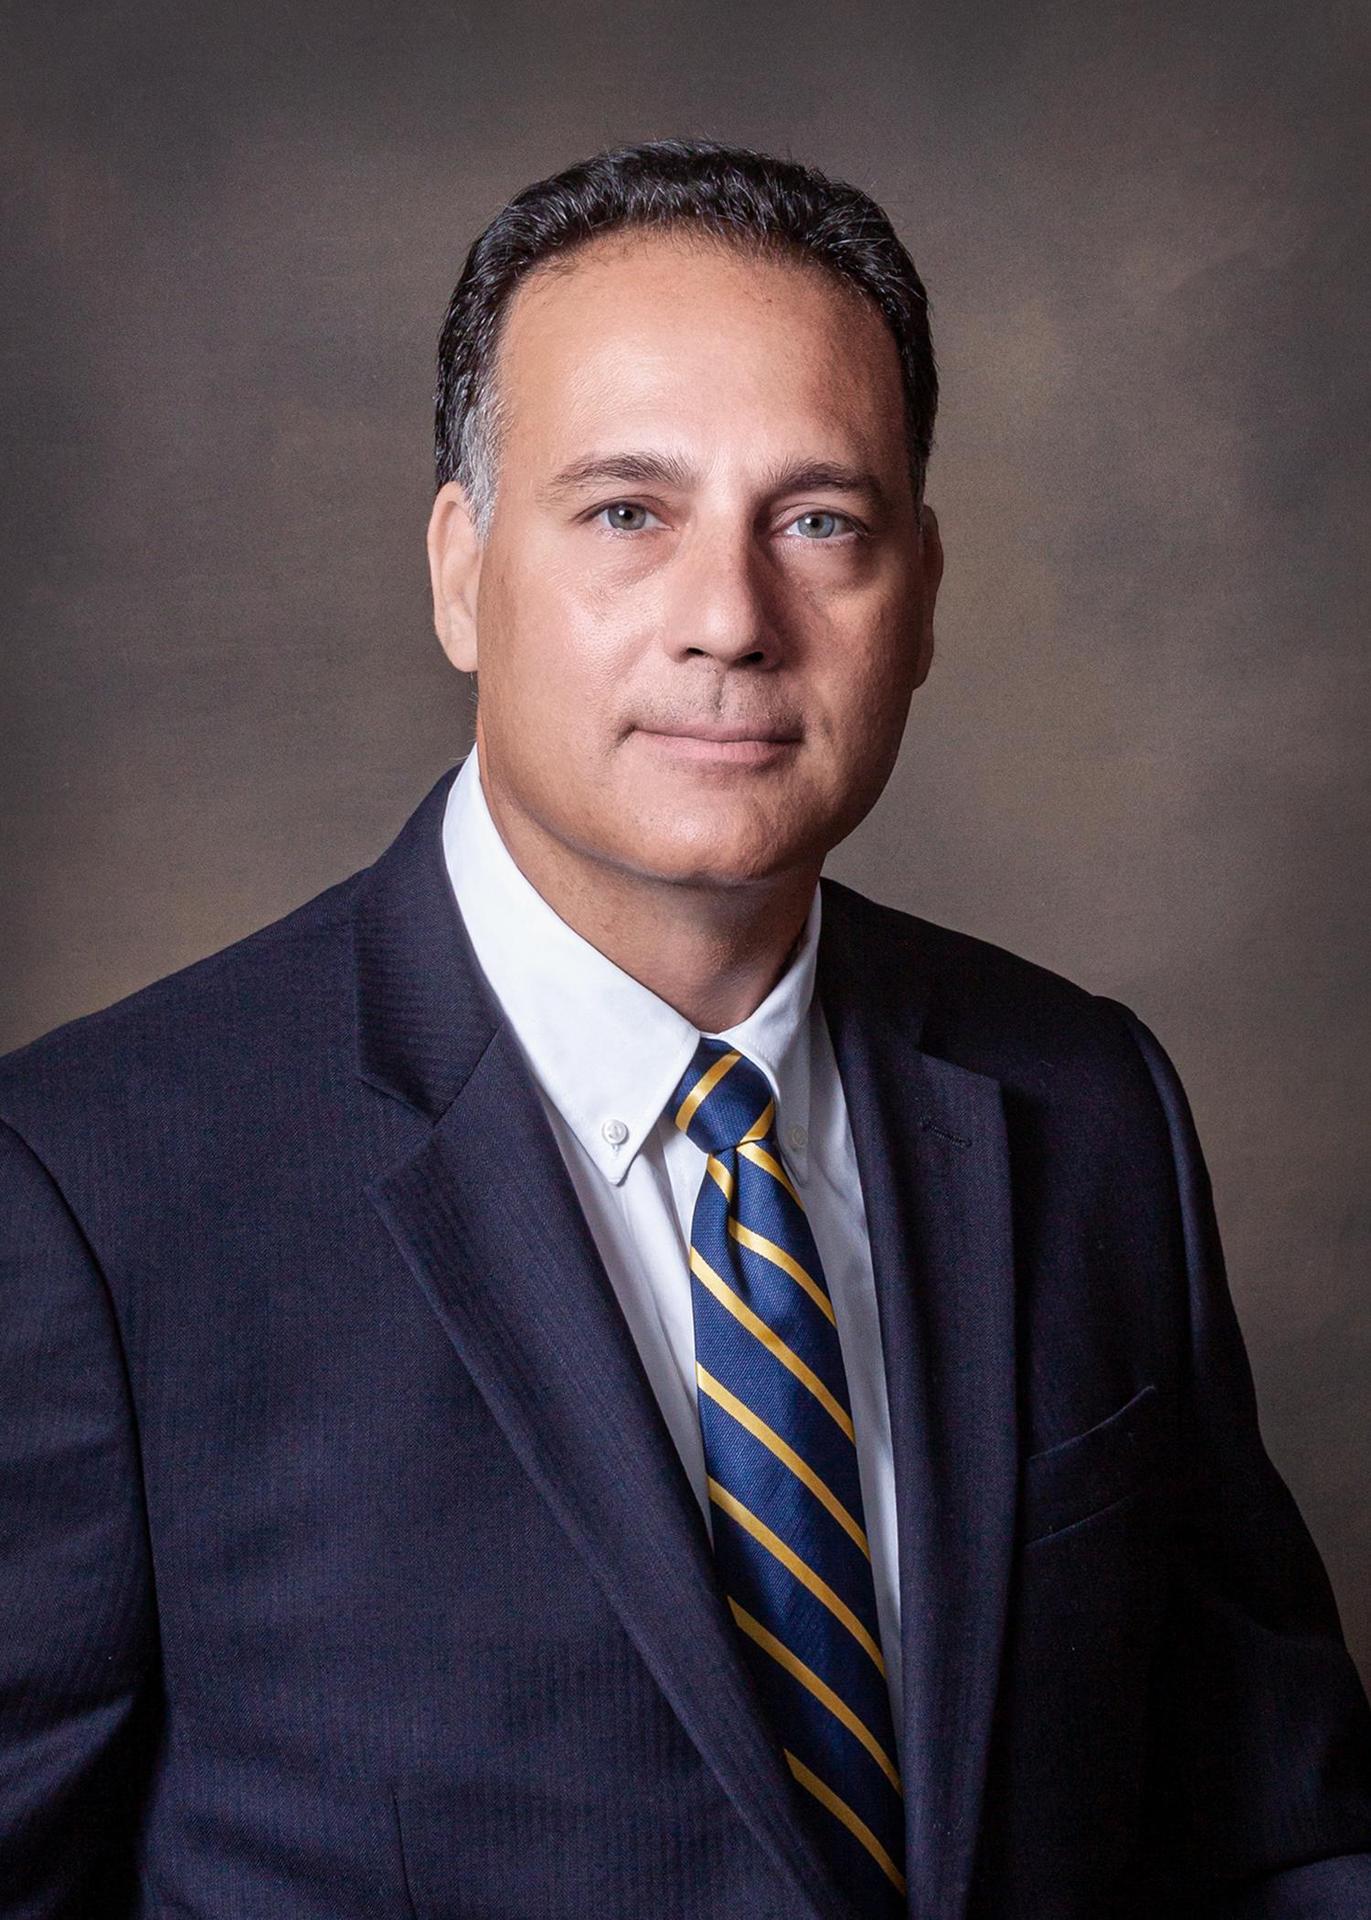 Dr. Steve Ellis